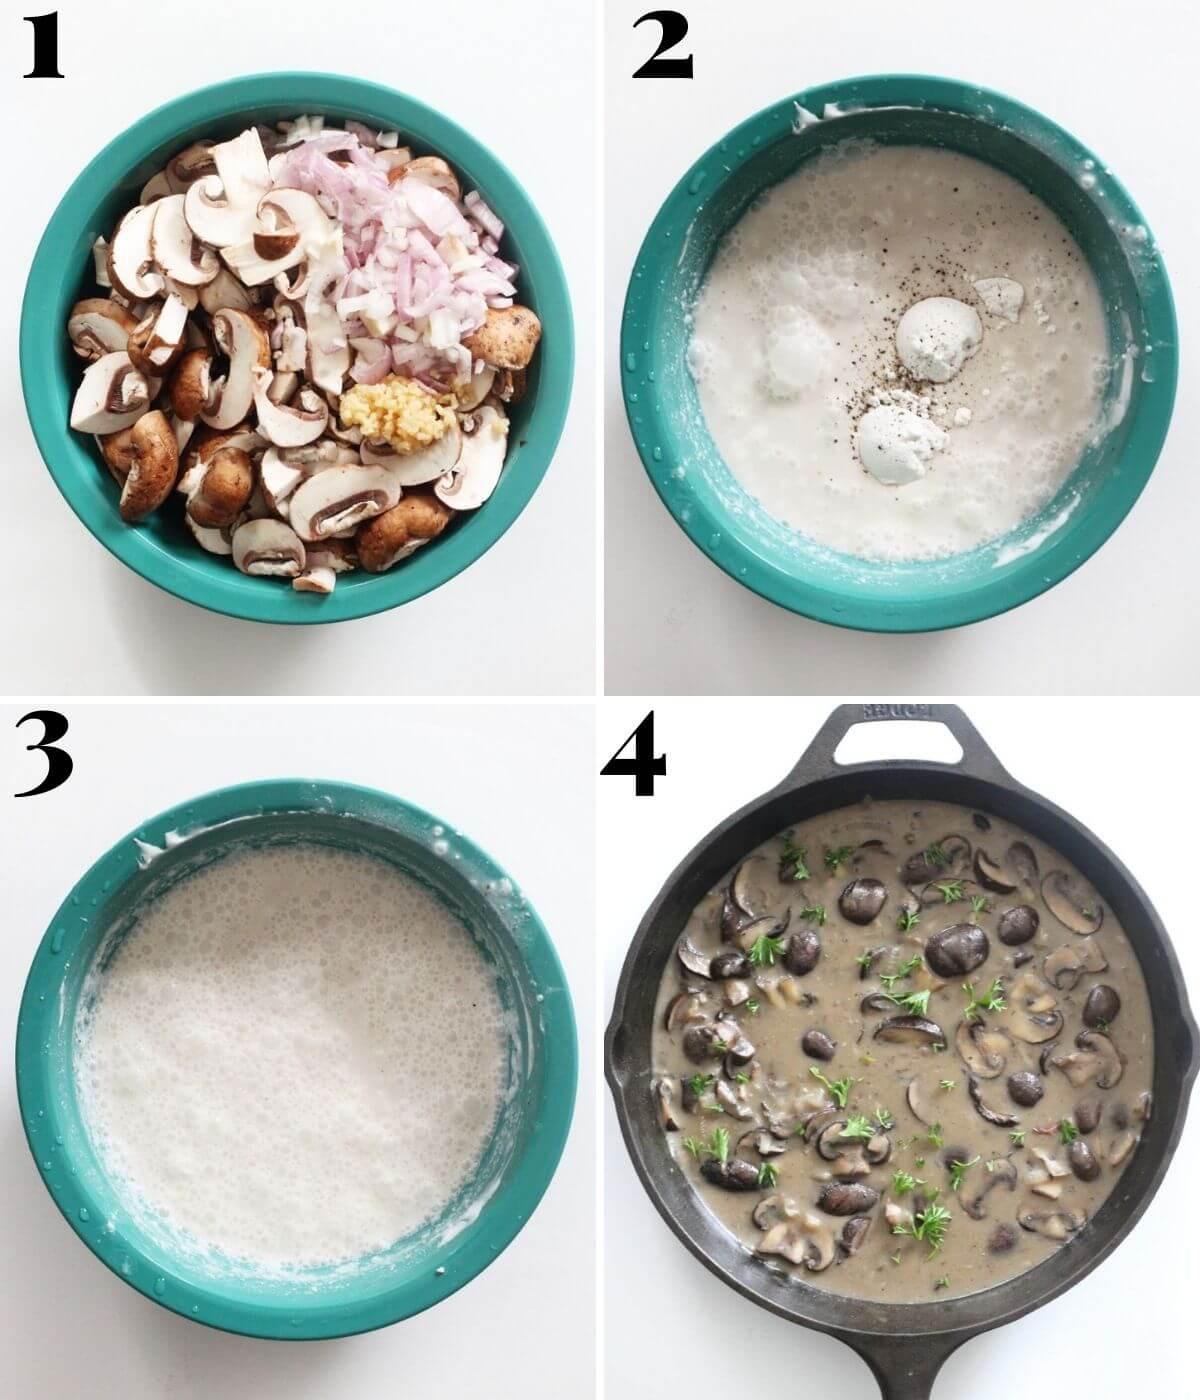 step-by-step process for making vegan mushroom stroganoff